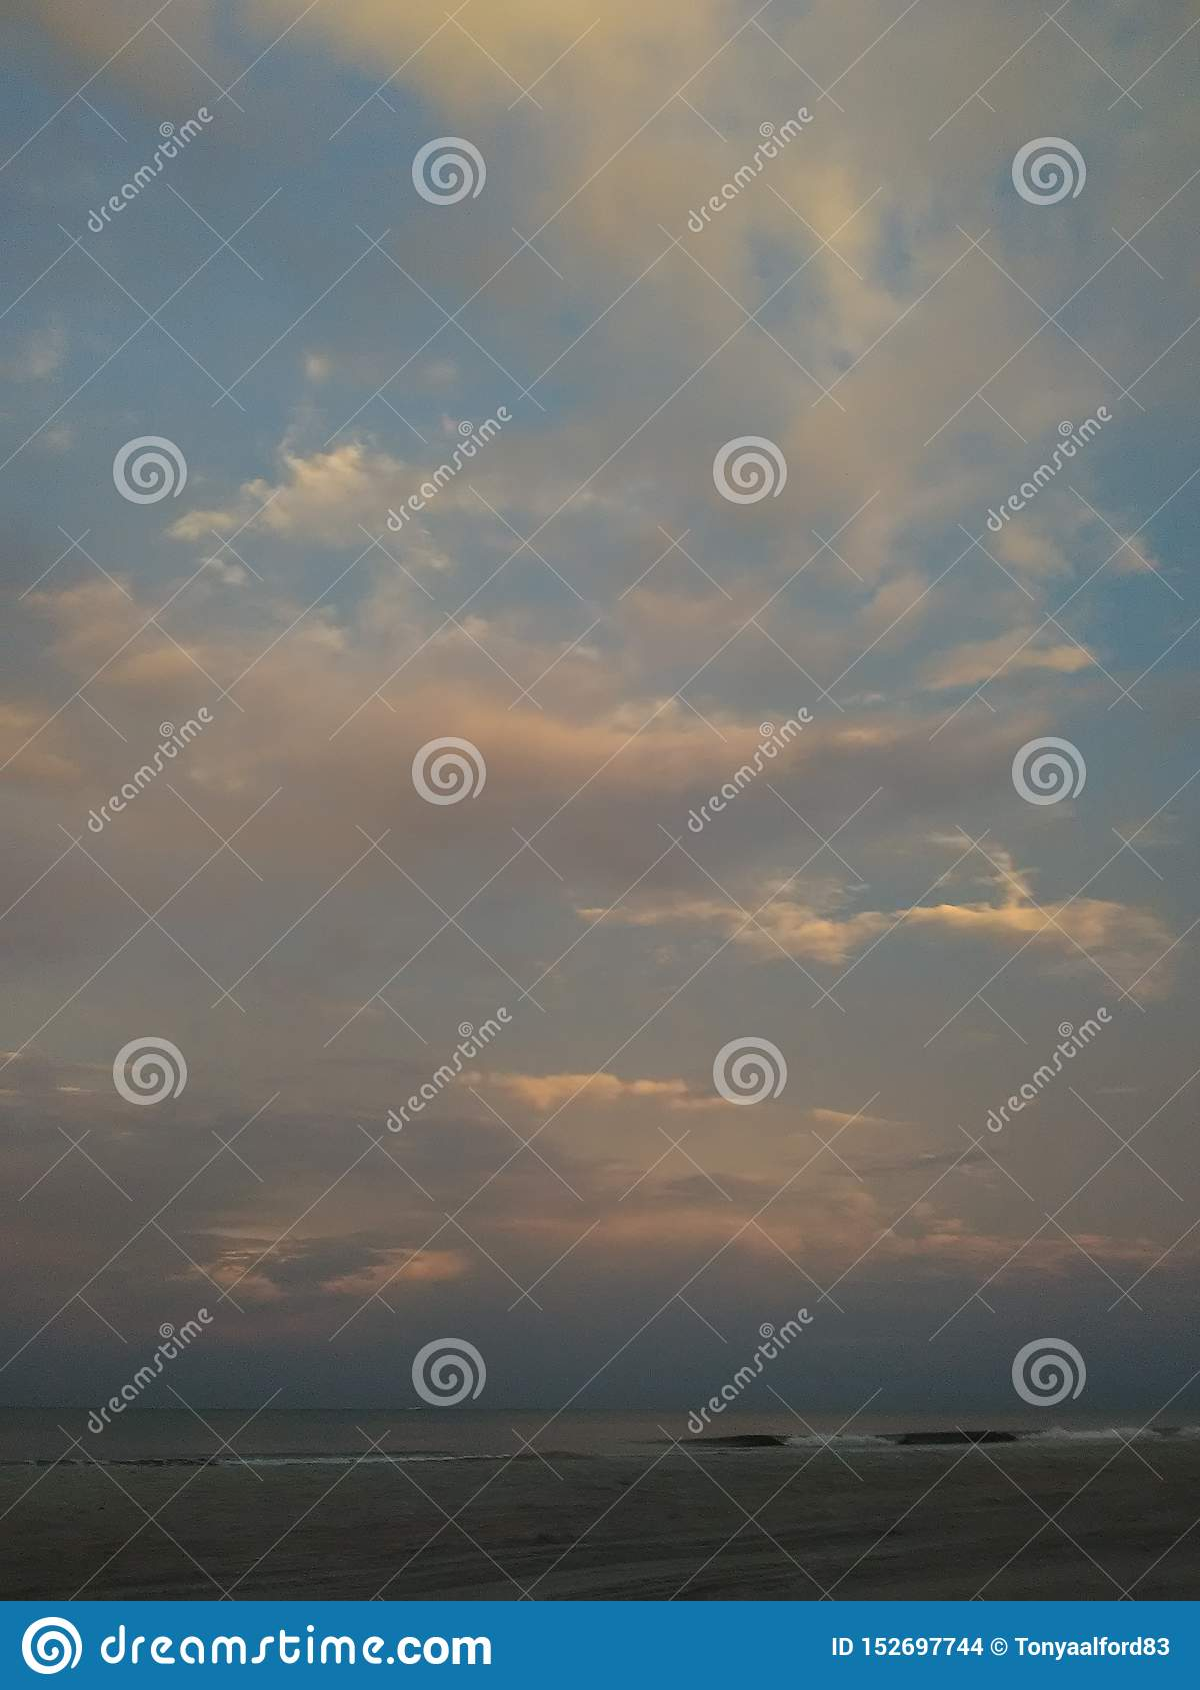 Beautiful sky art that is captured